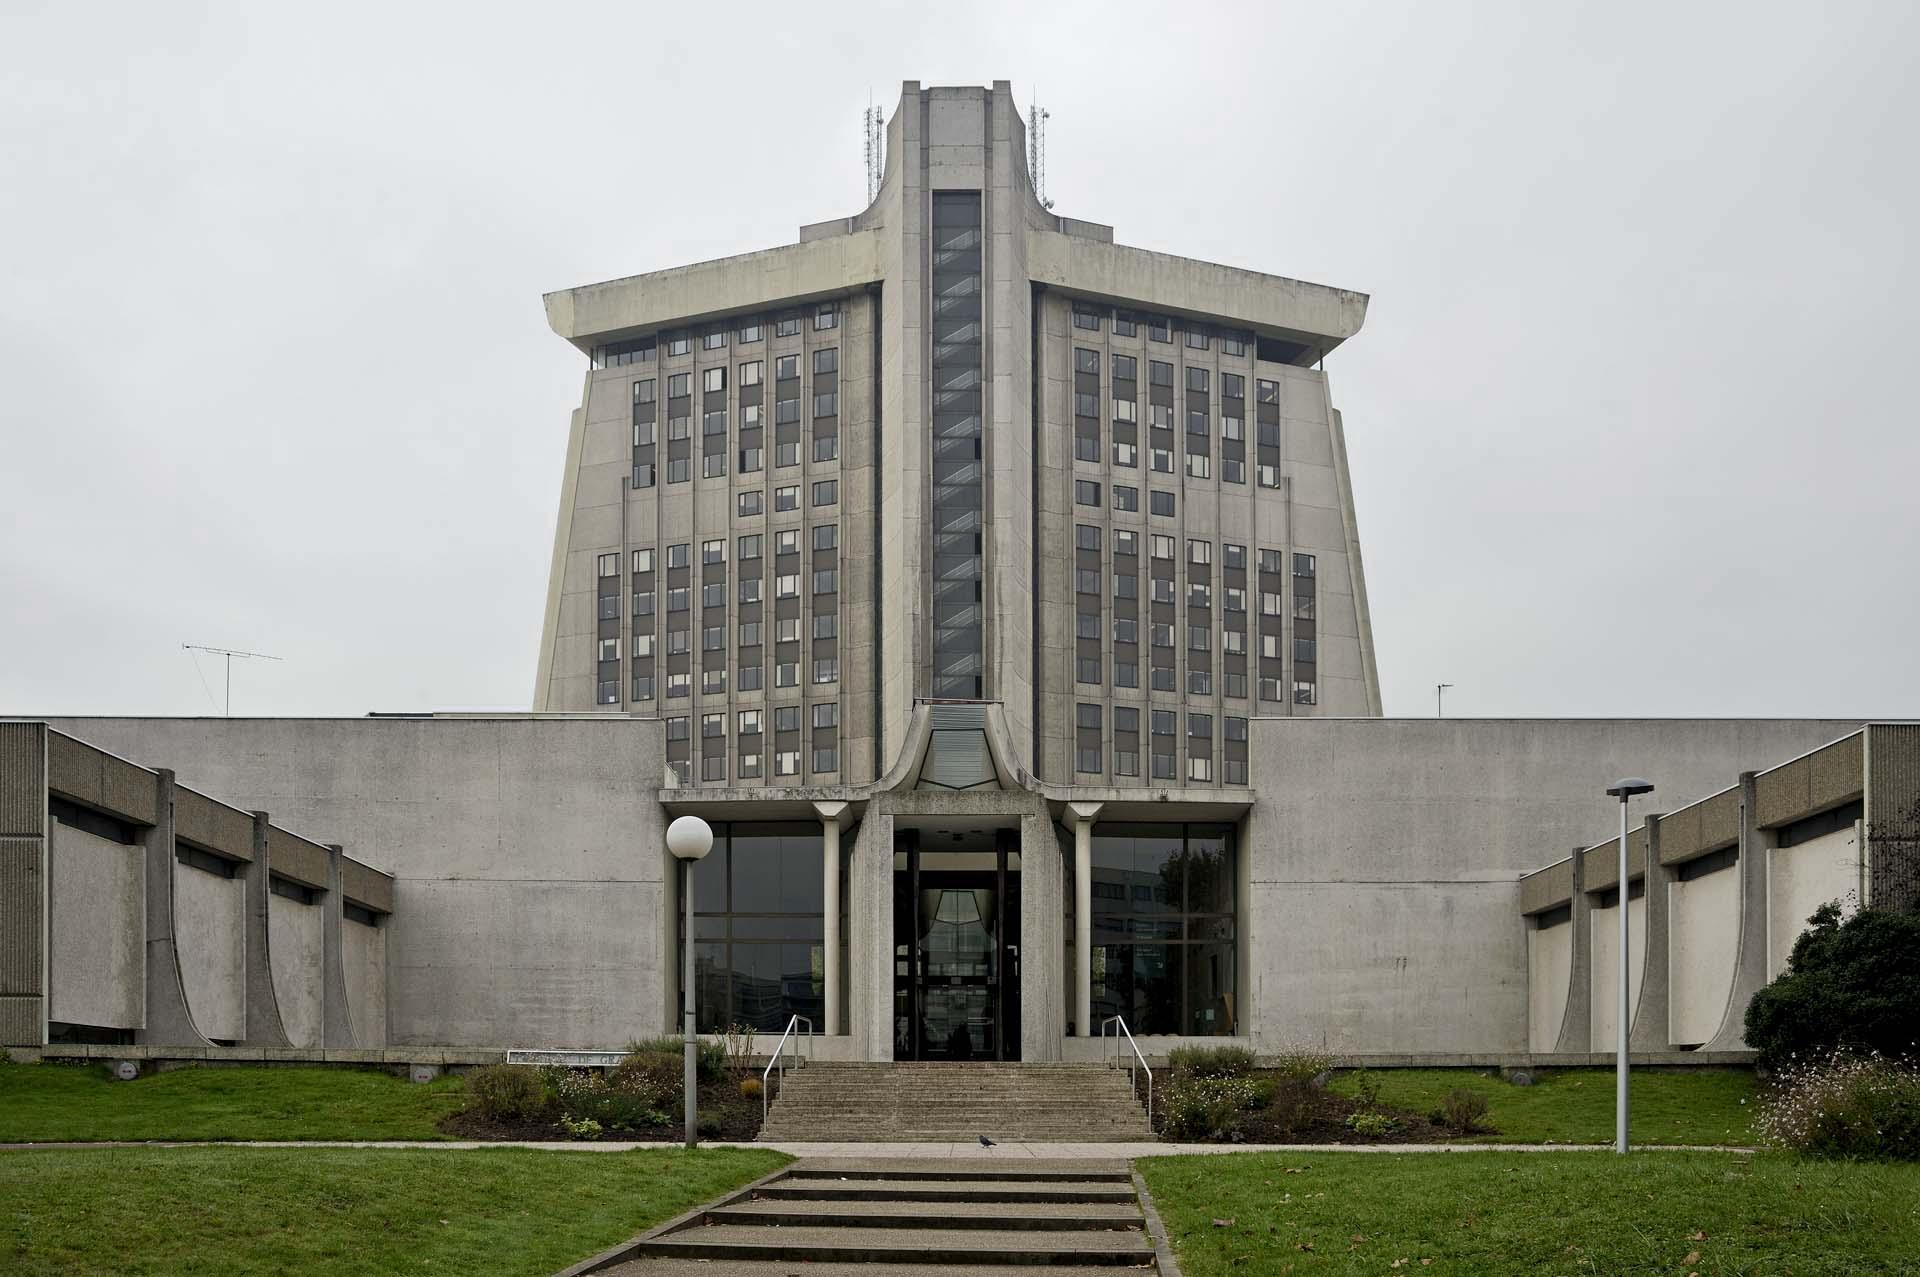 Palais de Justice, Creteil - Daniel Badani, 1978